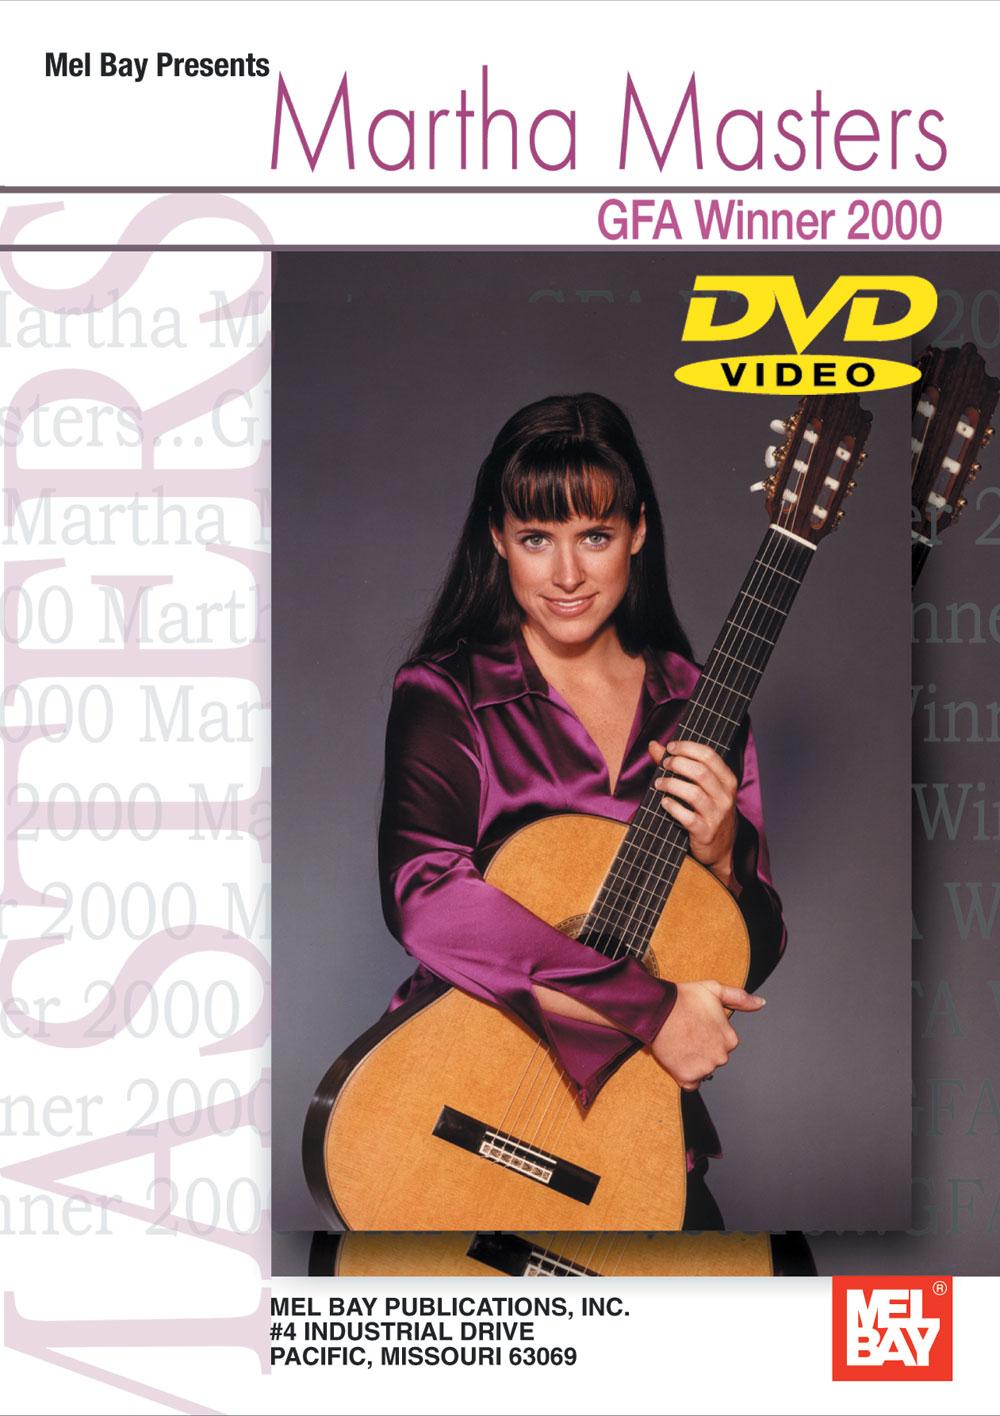 Martha Masters--gfa Winner 2000 Dvd